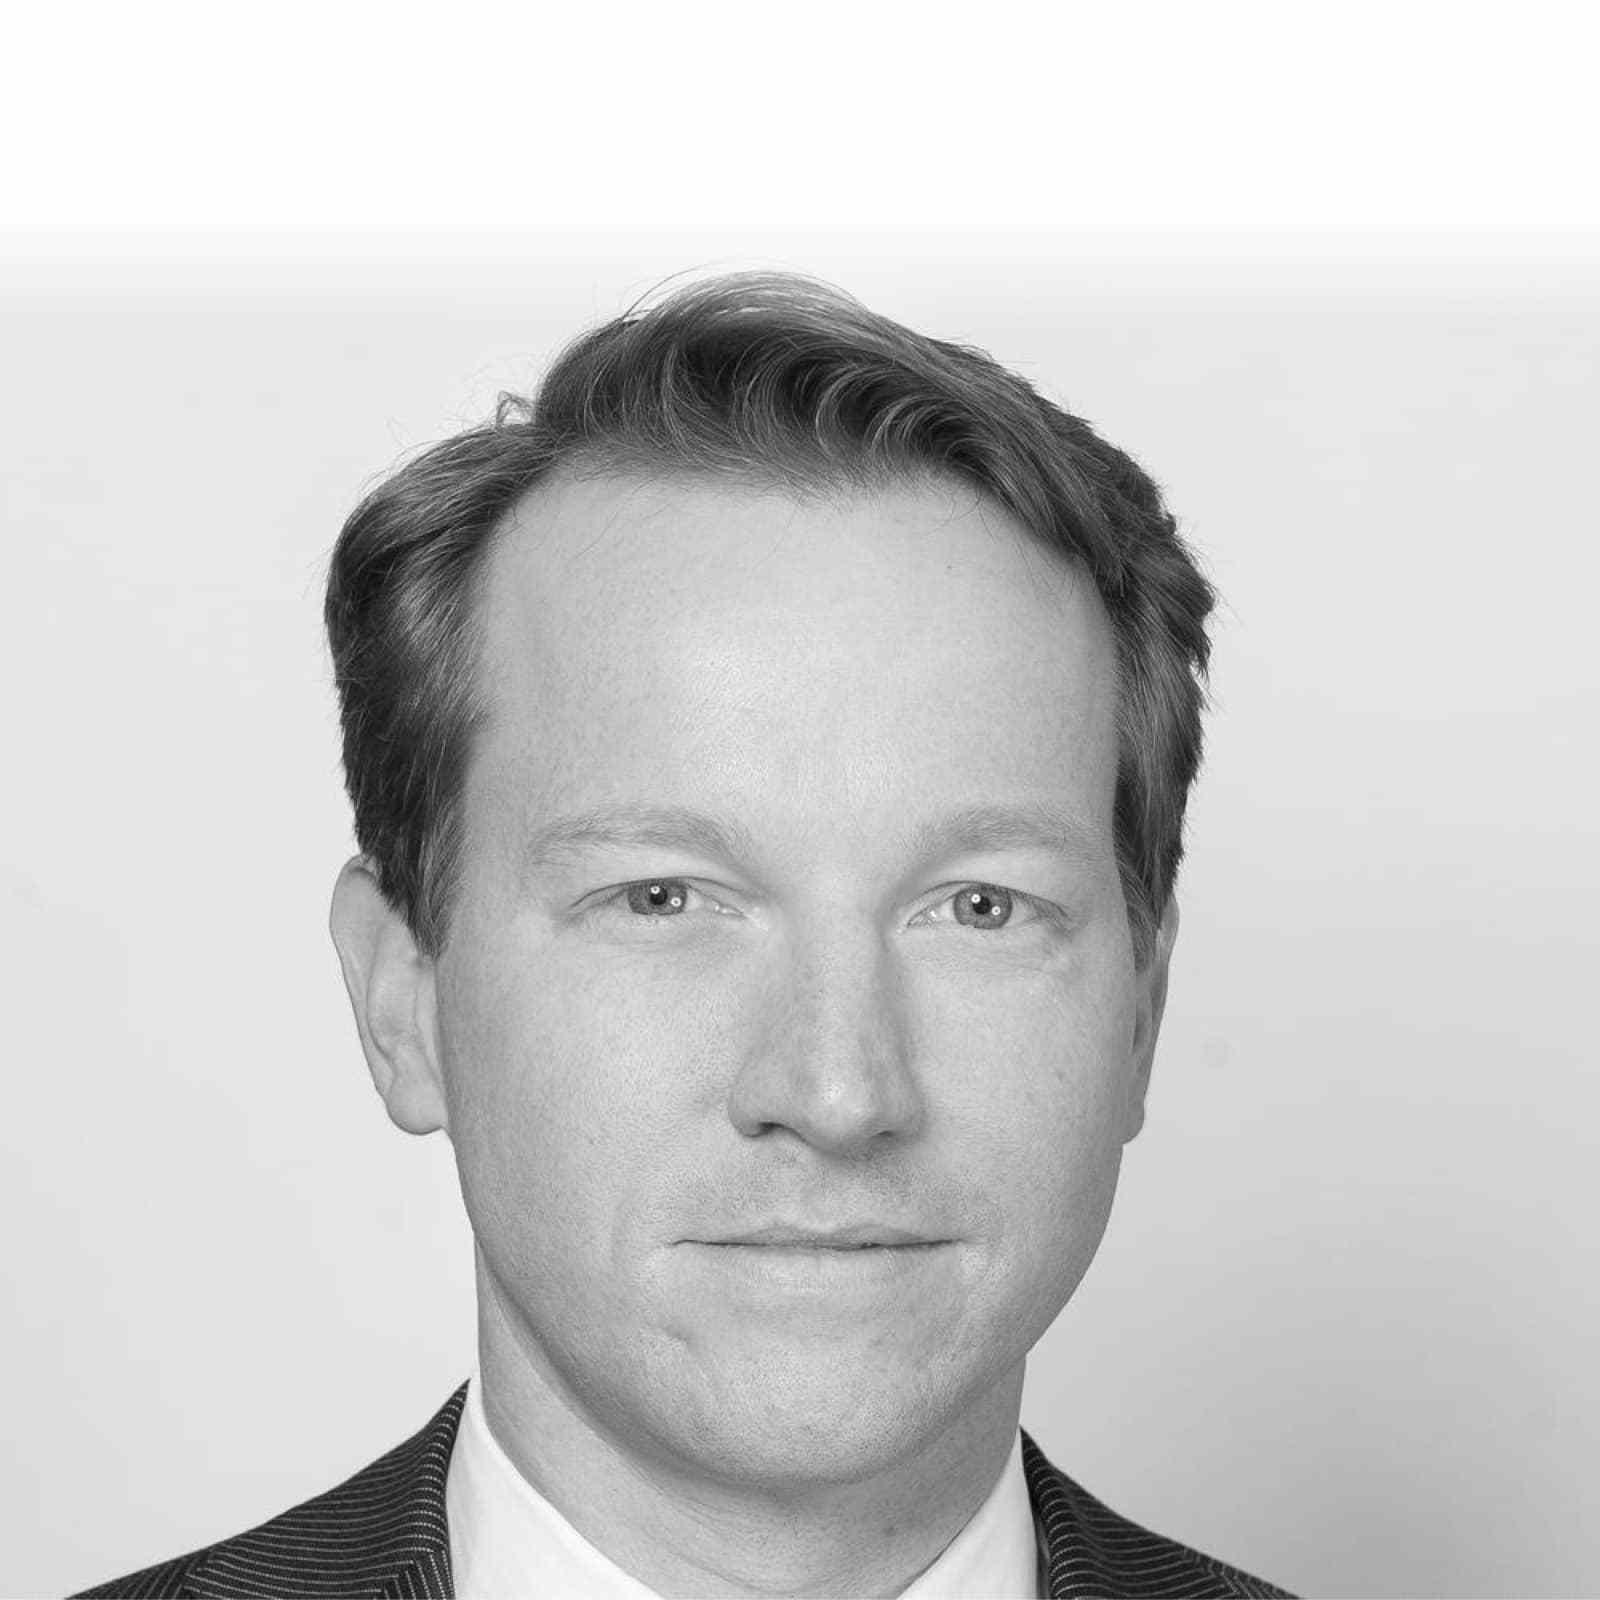 Christiaan Nederhof - Finance/Tax/IT in Amsterdam